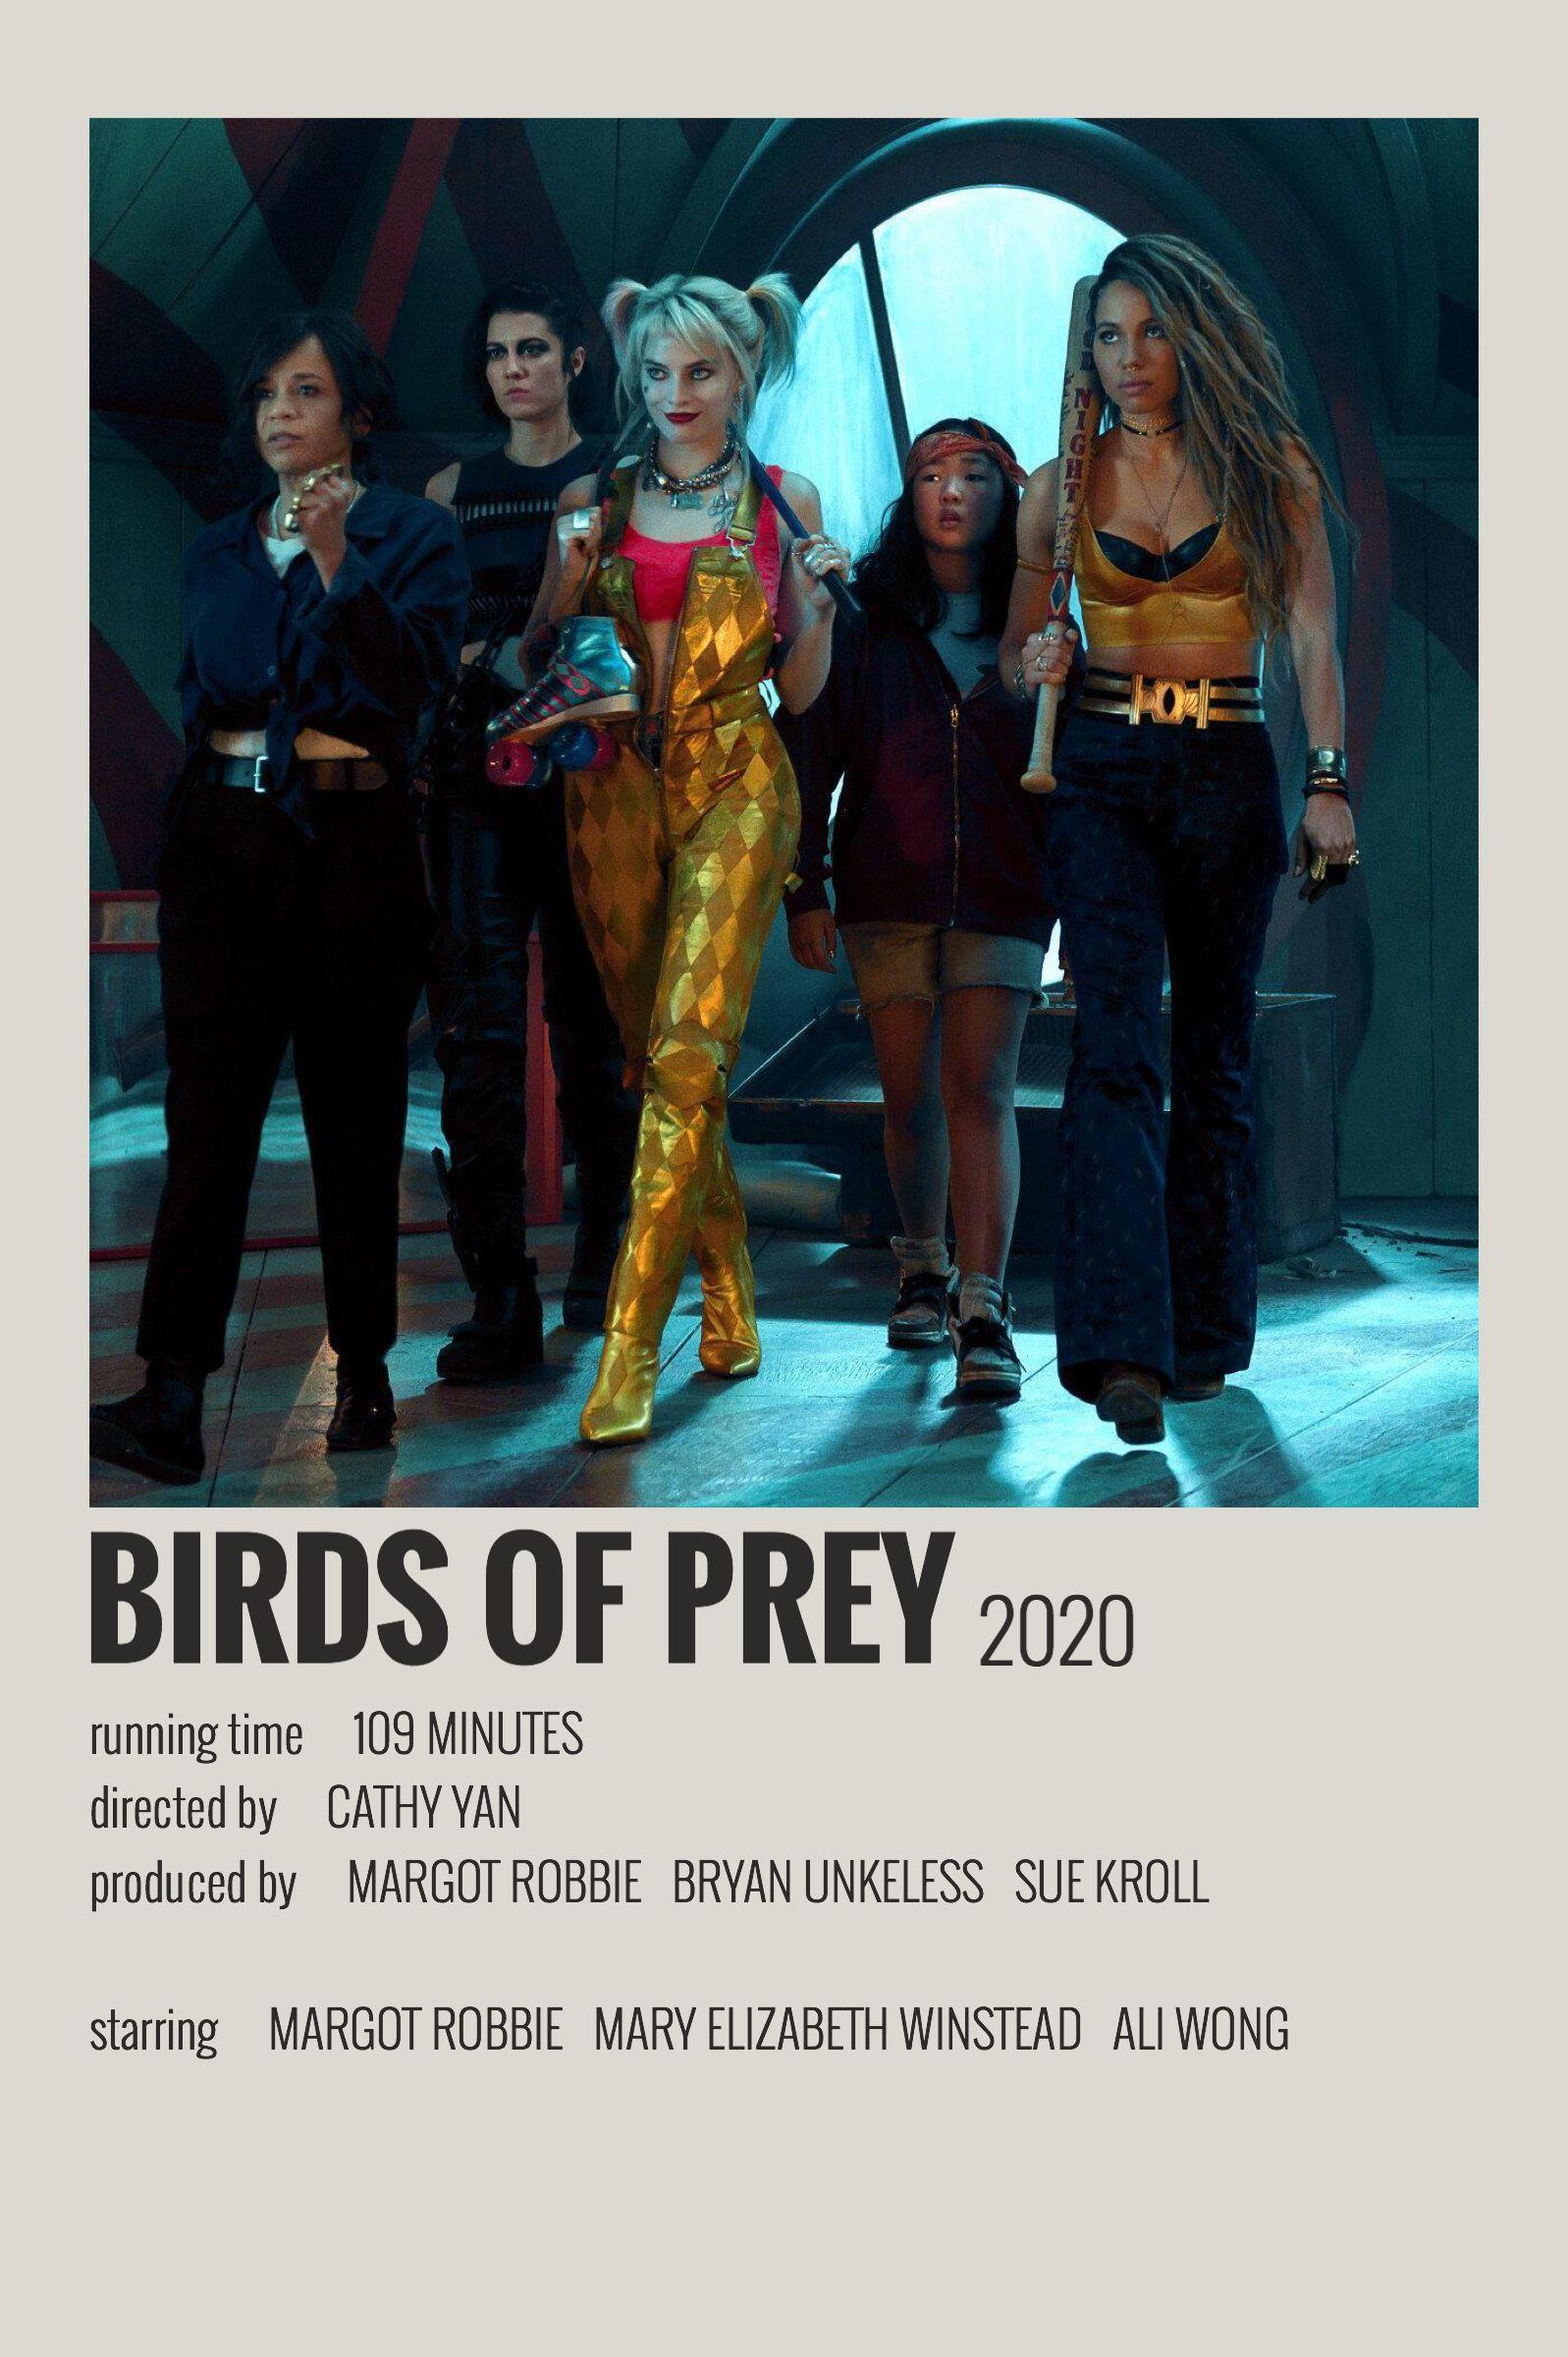 Birds Of Prey By Maja In 2020 Film Posters Minimalist Movie Poster Wall Movie Posters Minimalist